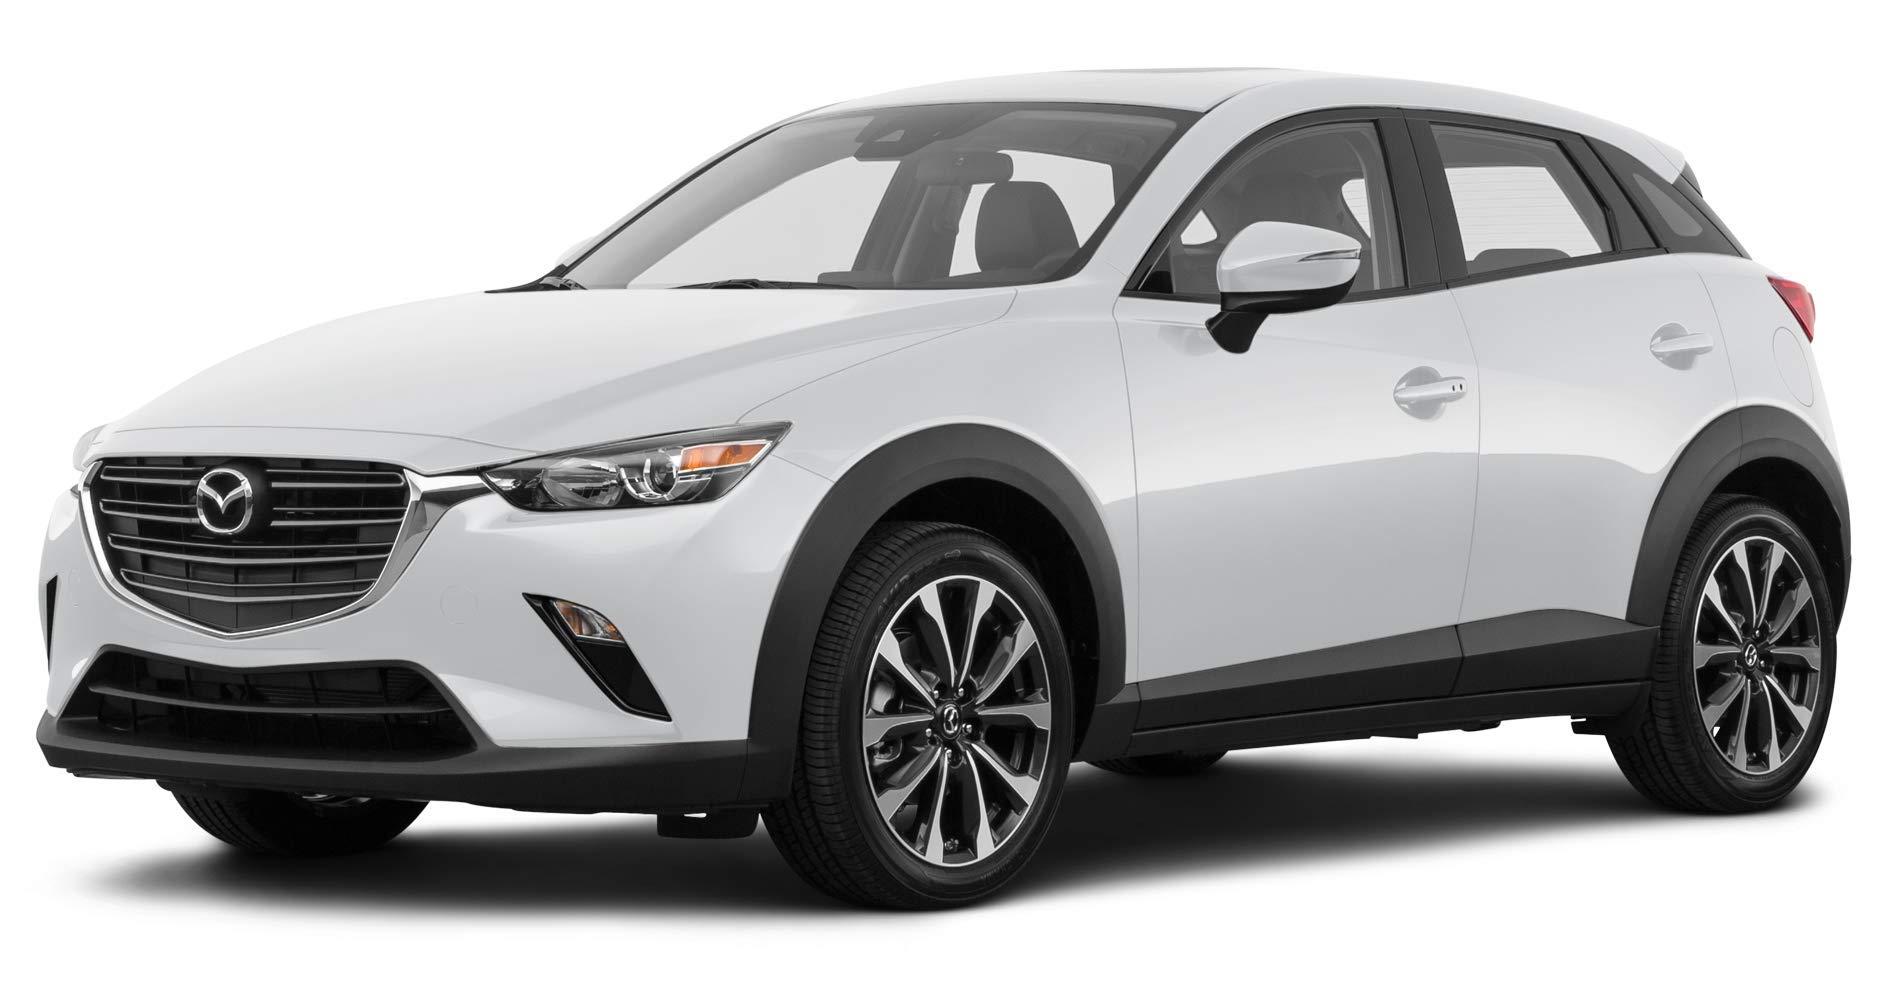 Amazon.com: 2019 Mazda CX-3 Grand Touring Reviews, Images ...